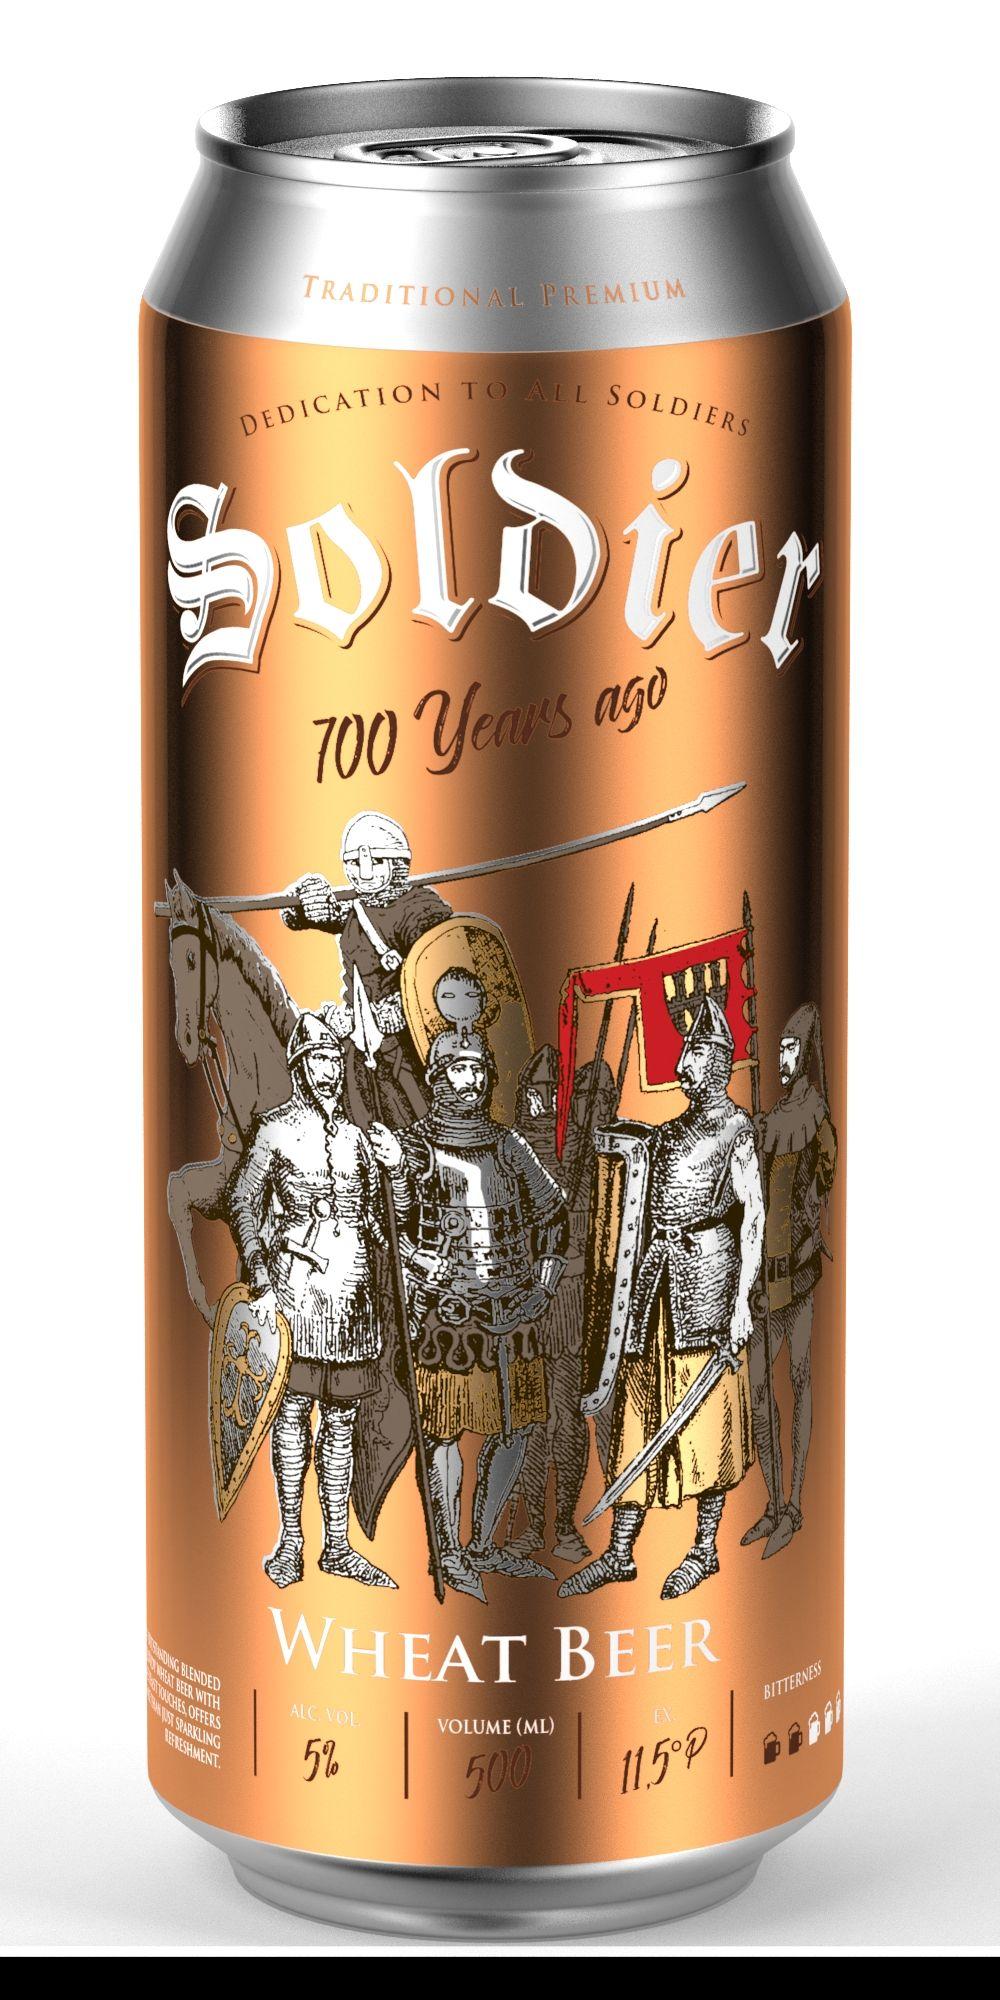 Kaya Blenders Launches Low Calorie Beer Soldiers Wheat Beer Low Calorie Beer Wheat Beer Beer